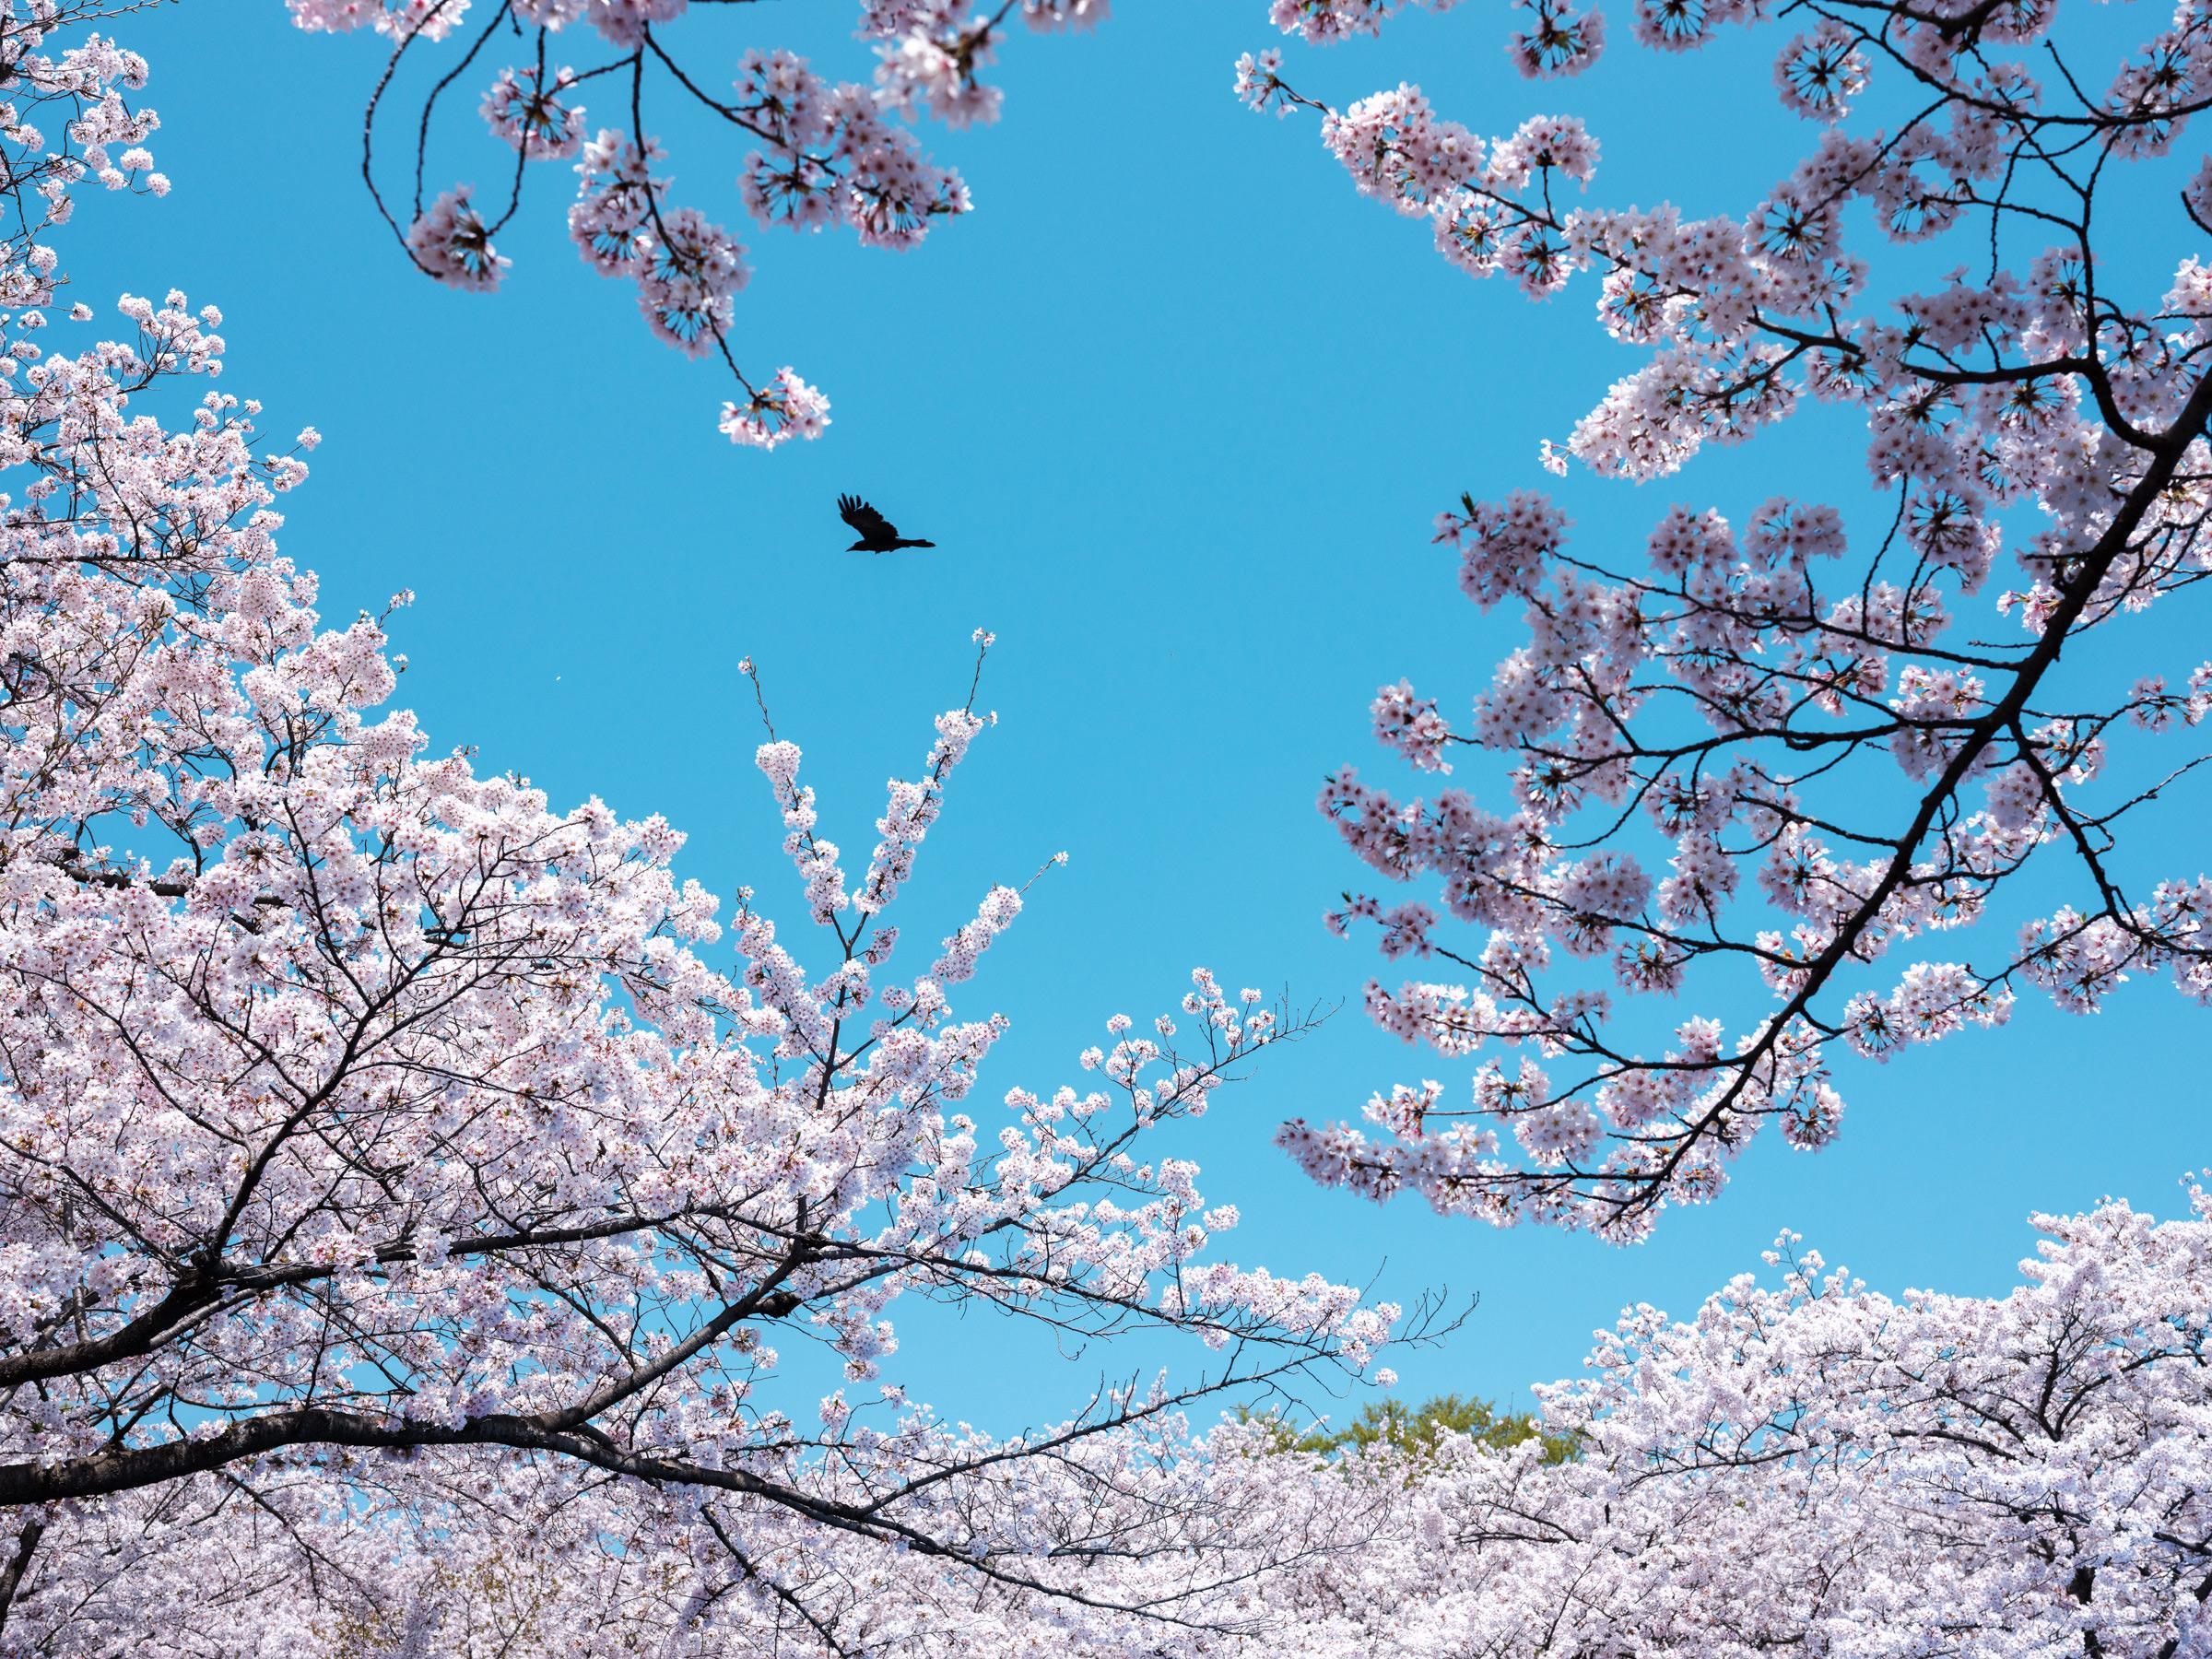 Fujifilm-GFX-Japan-Street-Photography-41